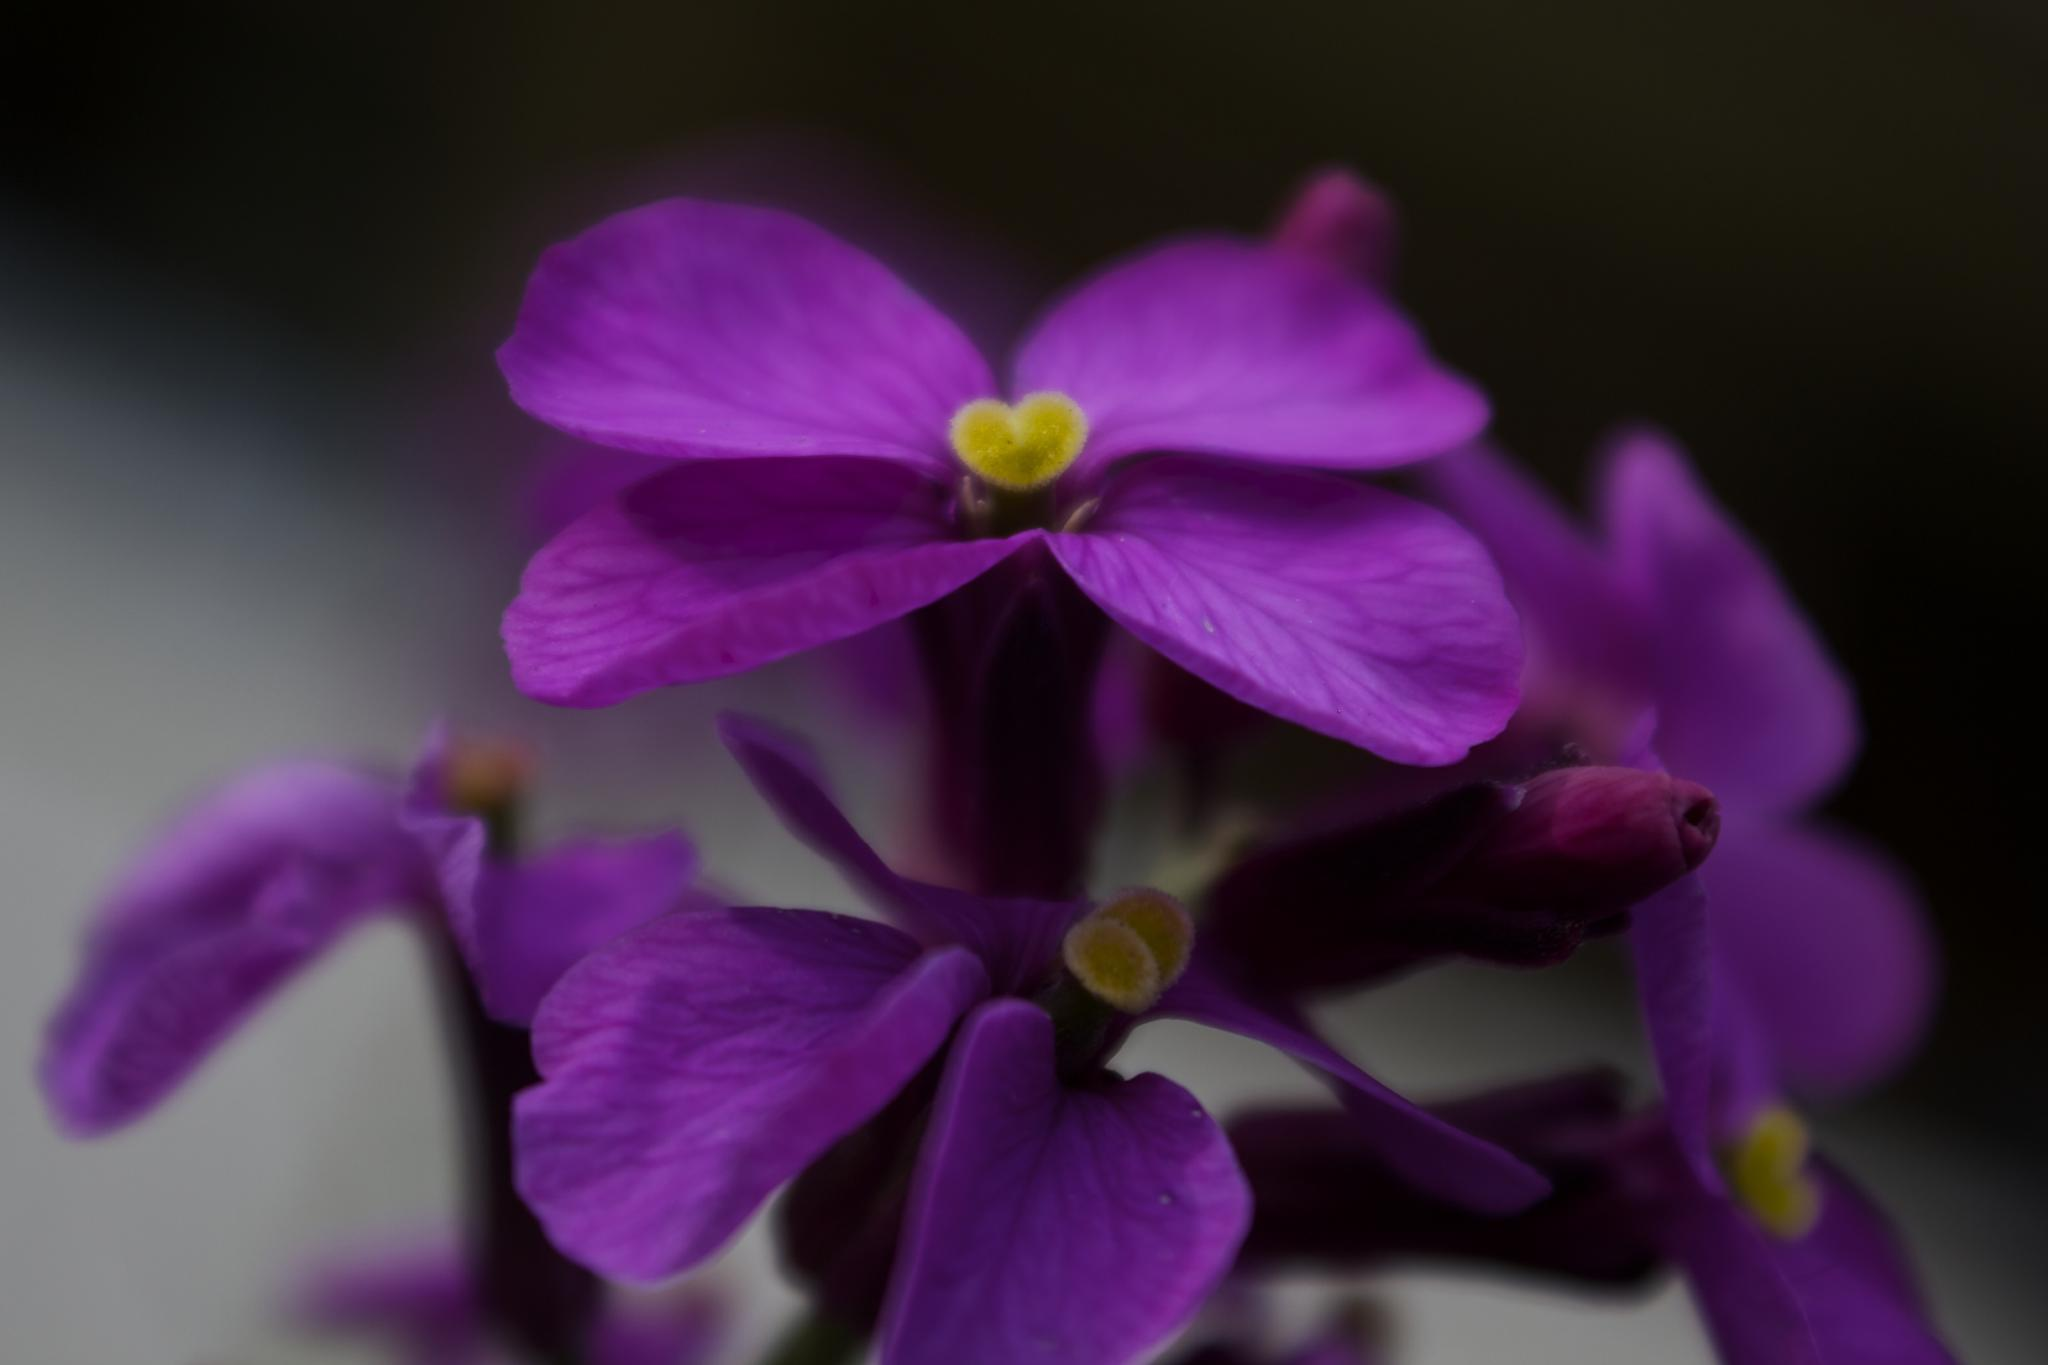 flower by Azucena Kouwenhoven